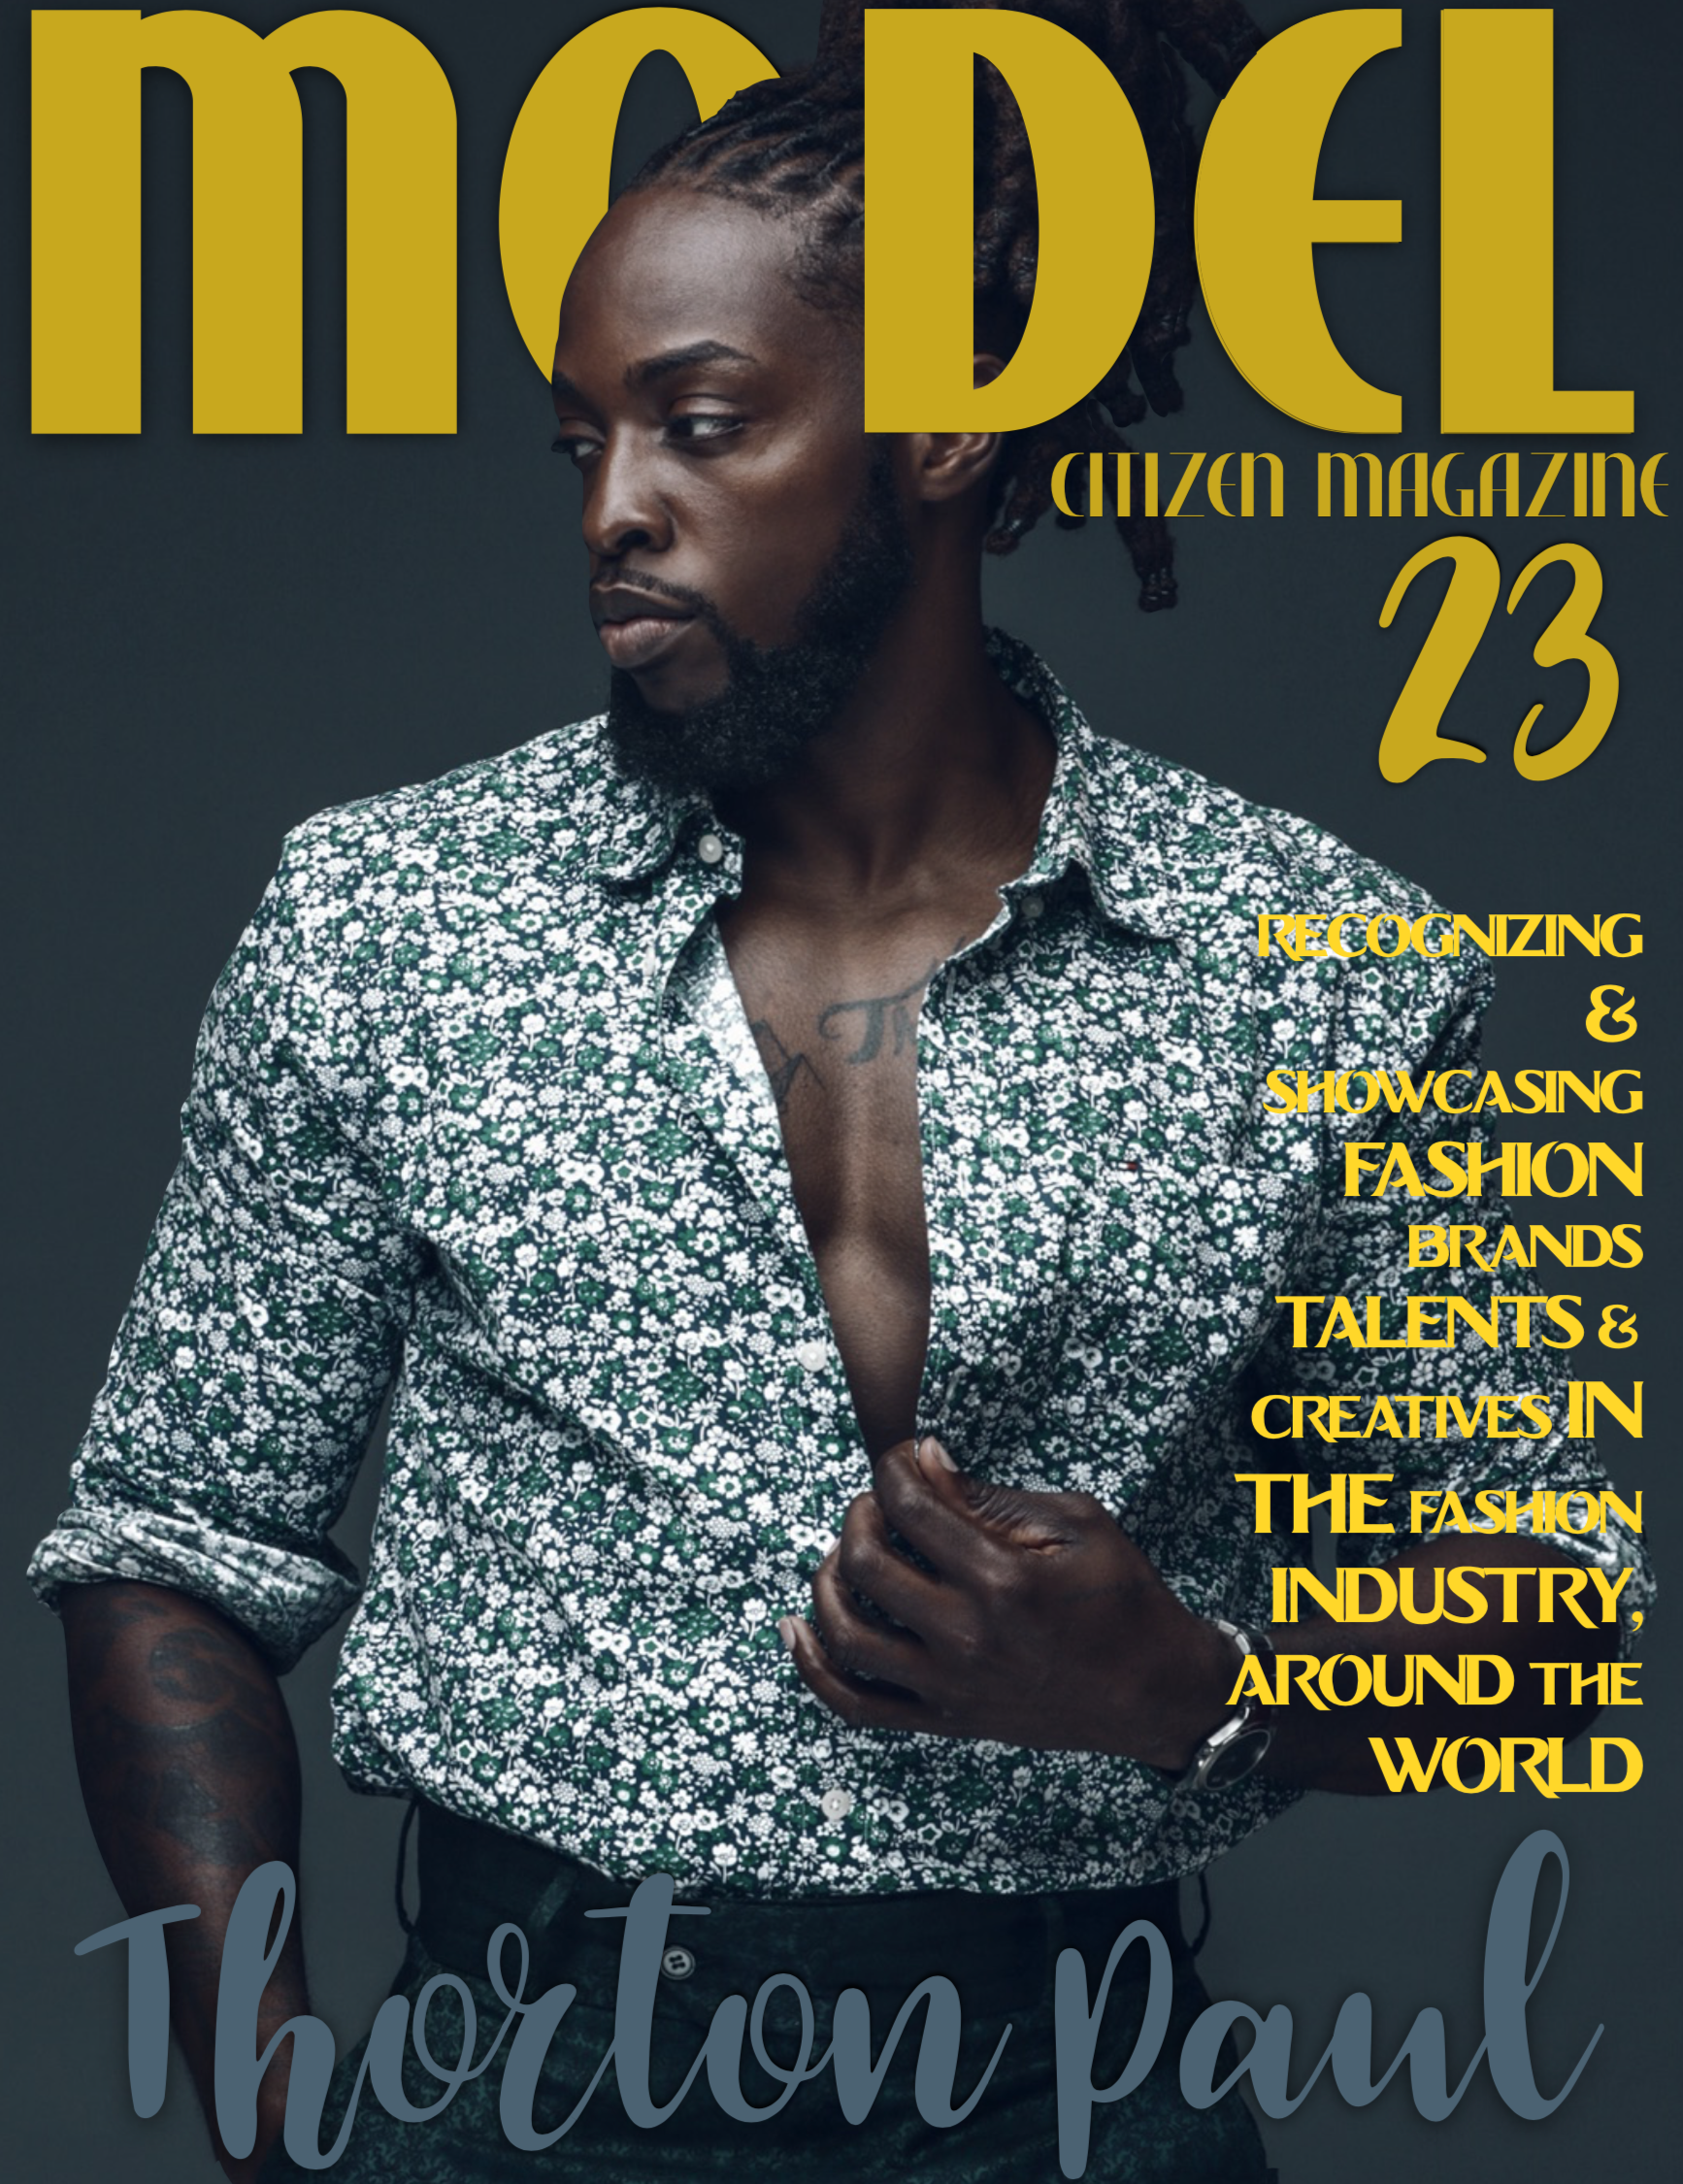 Model Citizen Magazine Reviews, Model Citizen Media, Best Fashion Magazine, Macky Suson, List of Fashion Magazine, Model Citizen Magazine Issue 23